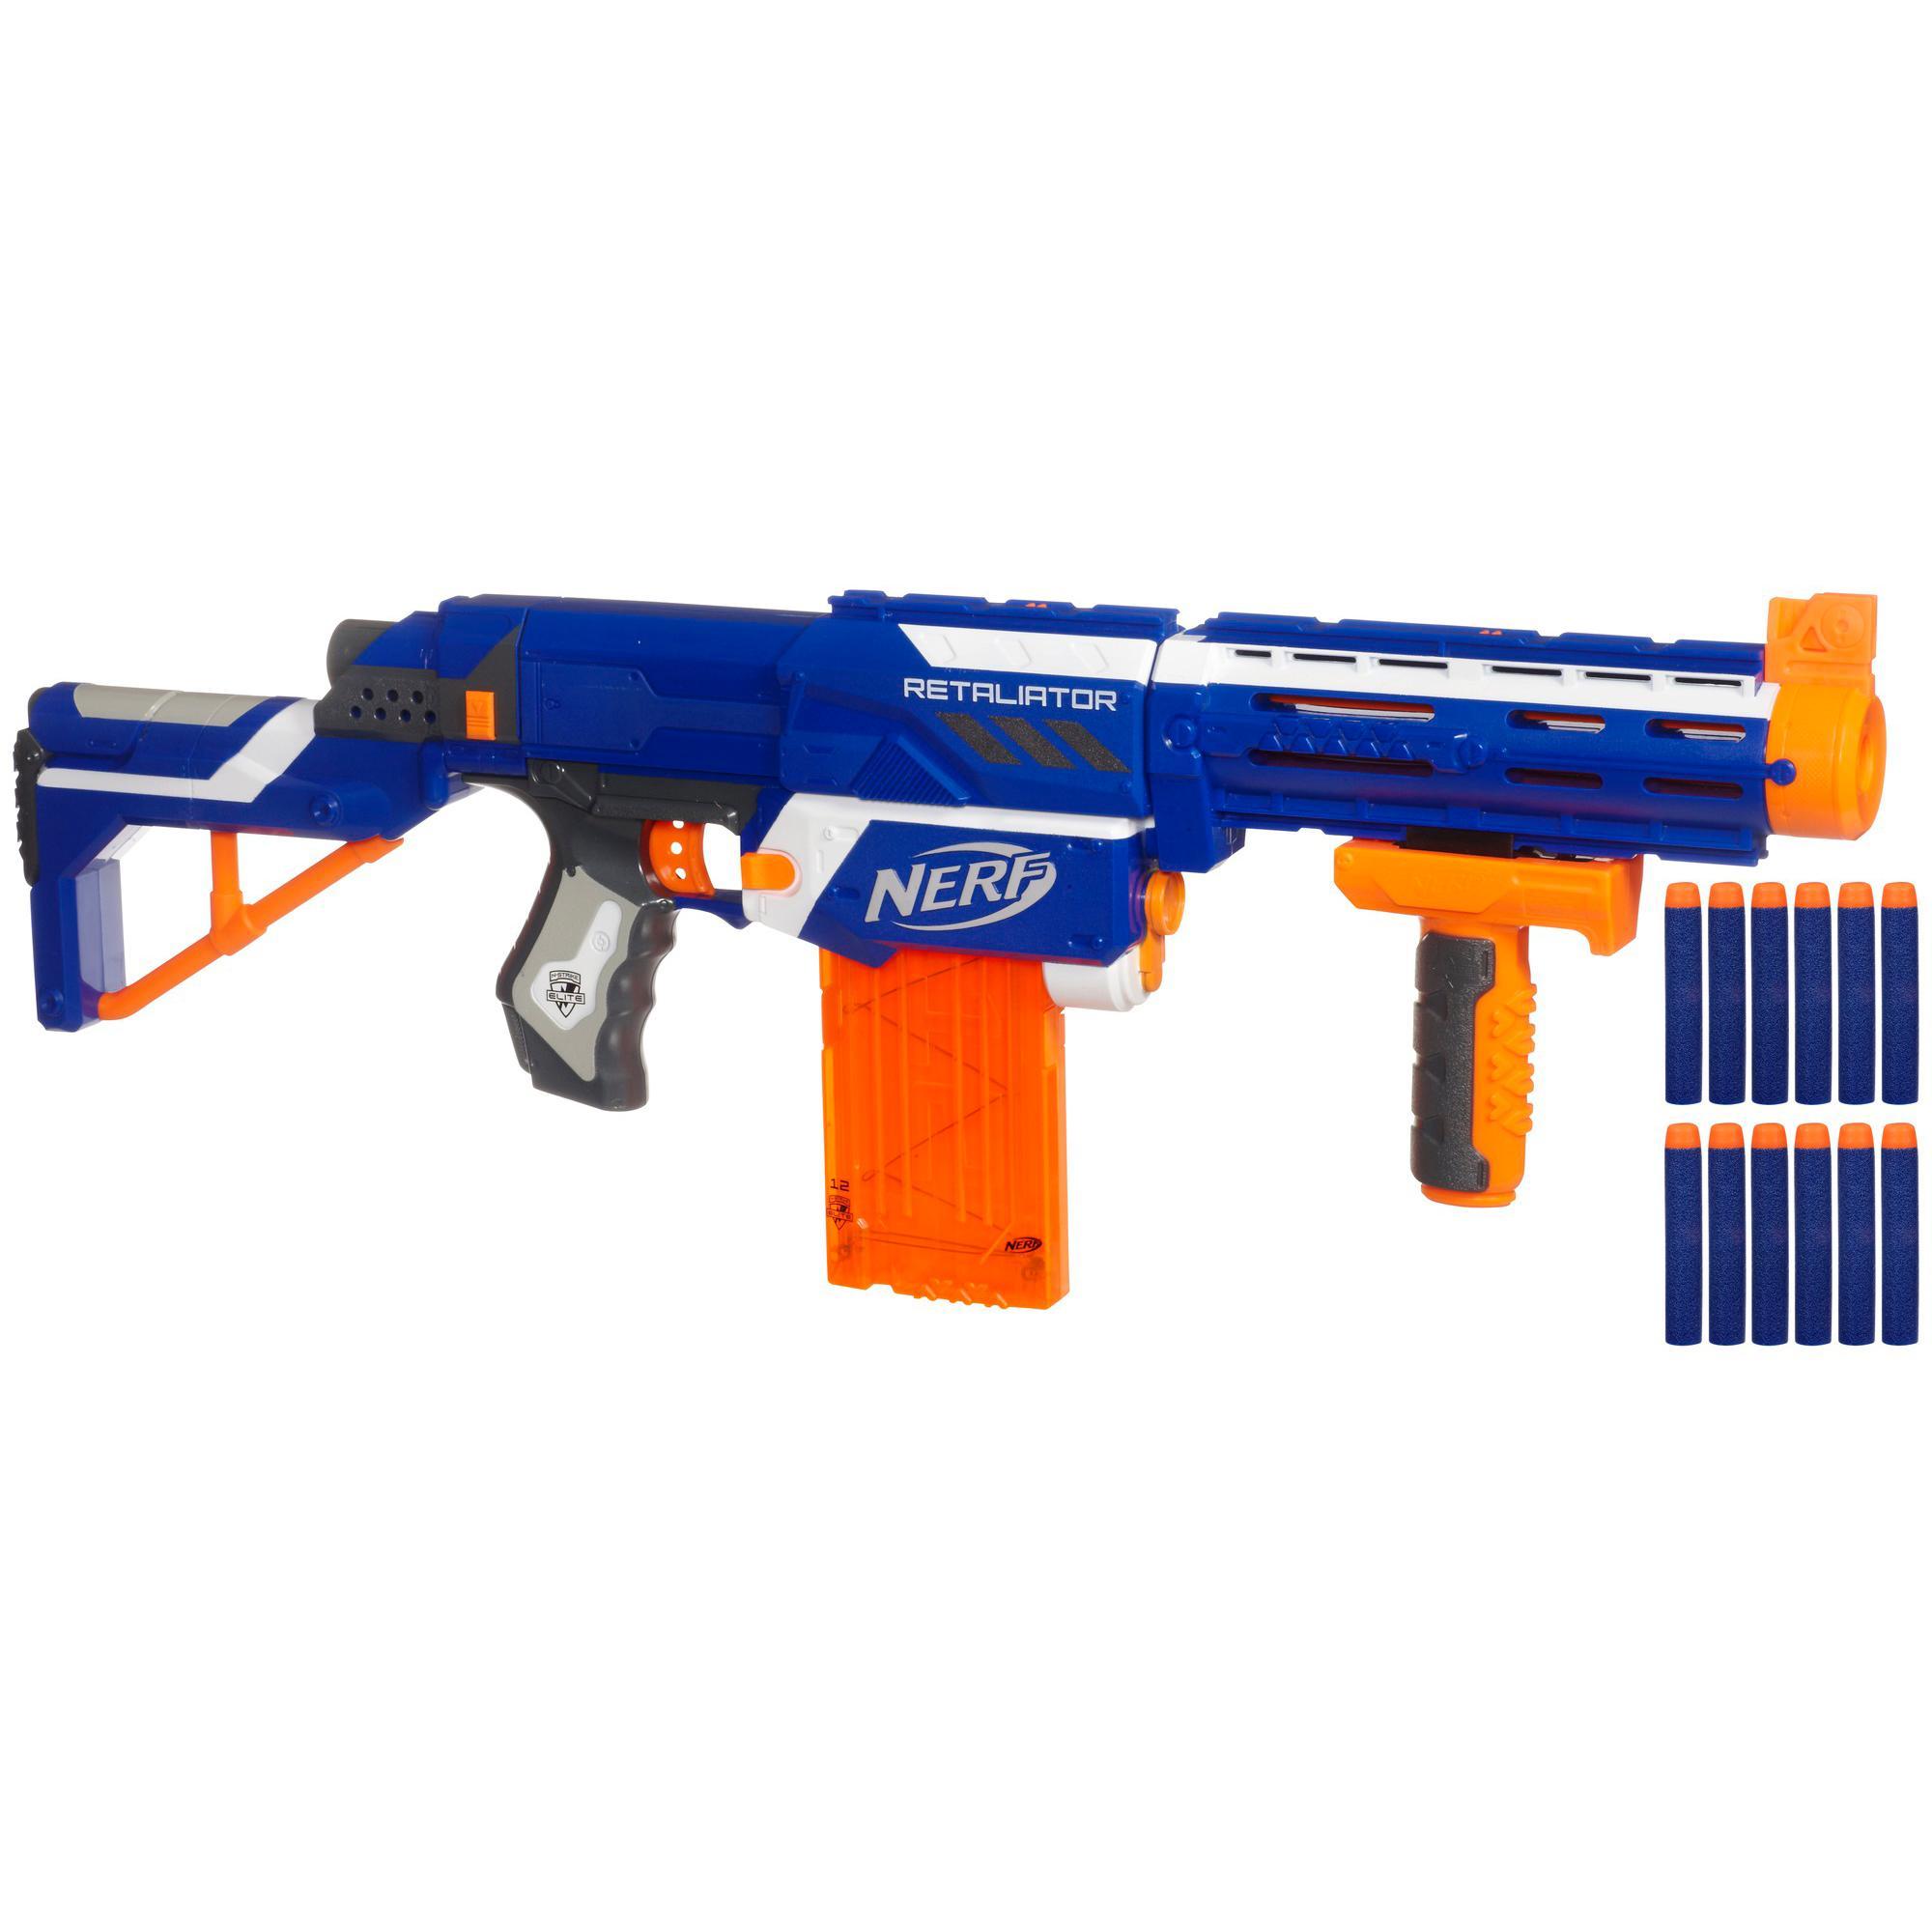 10pcs Blue foam bullets For Nerf Guns